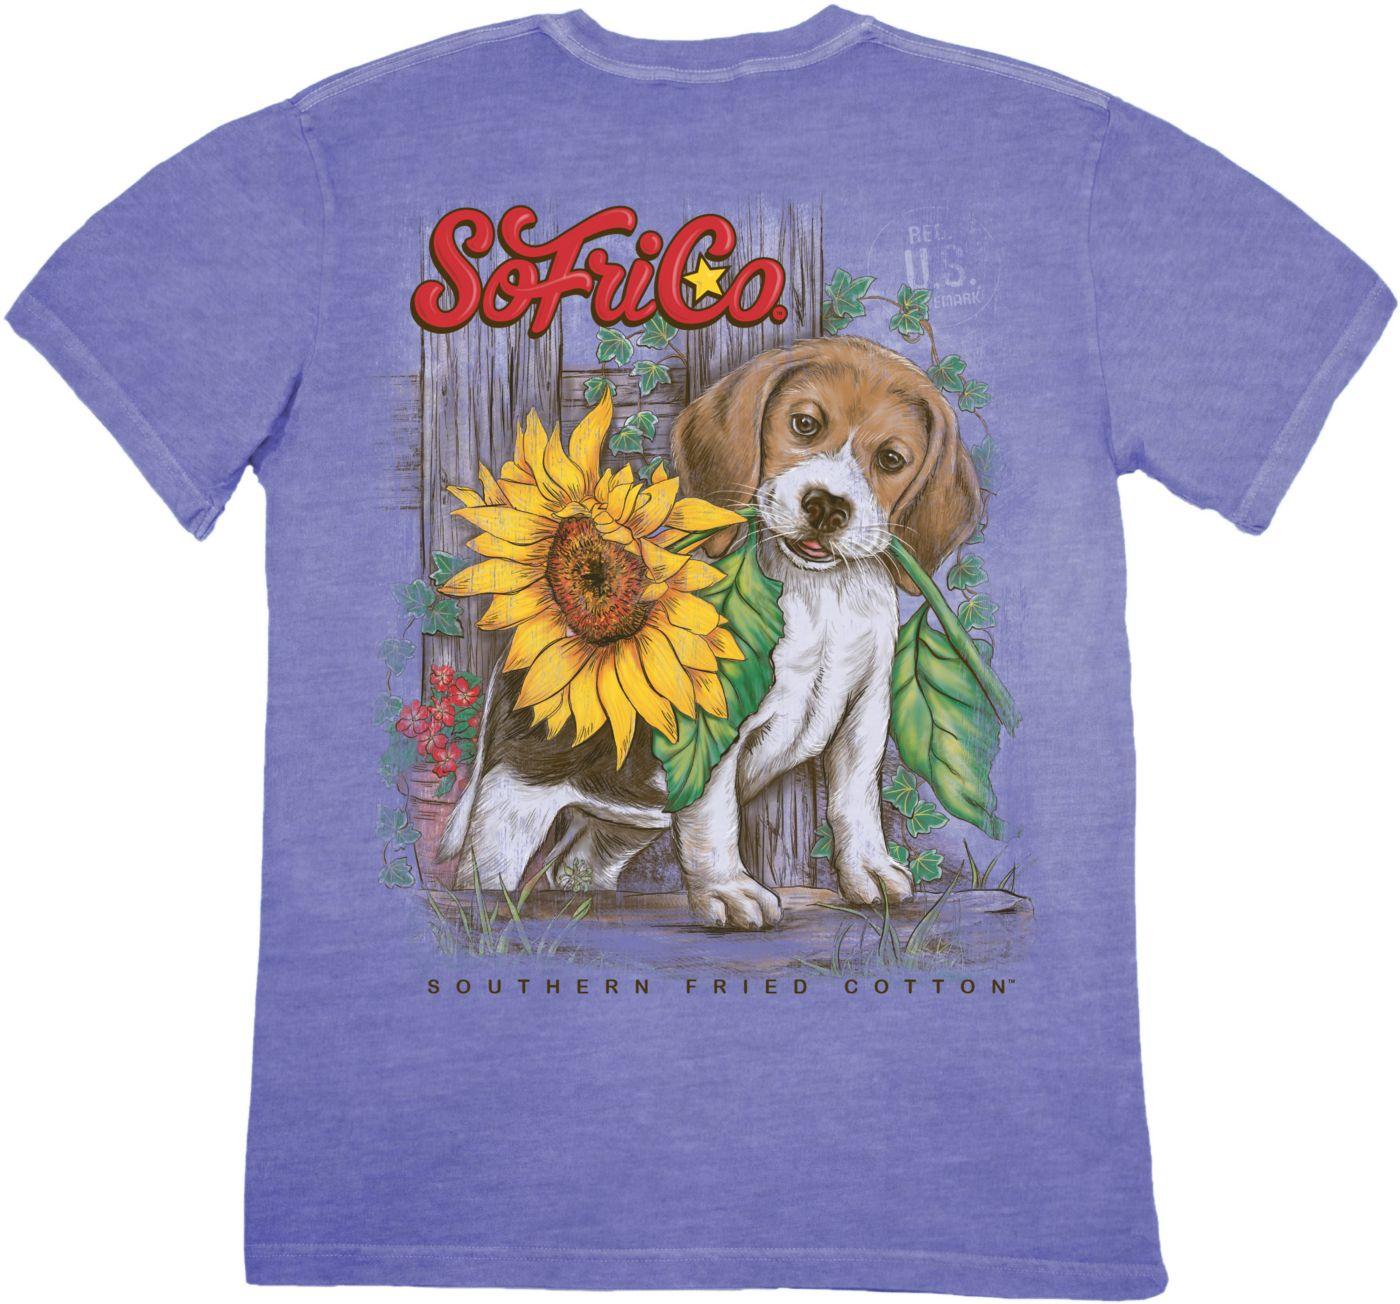 Southern Fried Cotton Women's Sunny T-Shirt